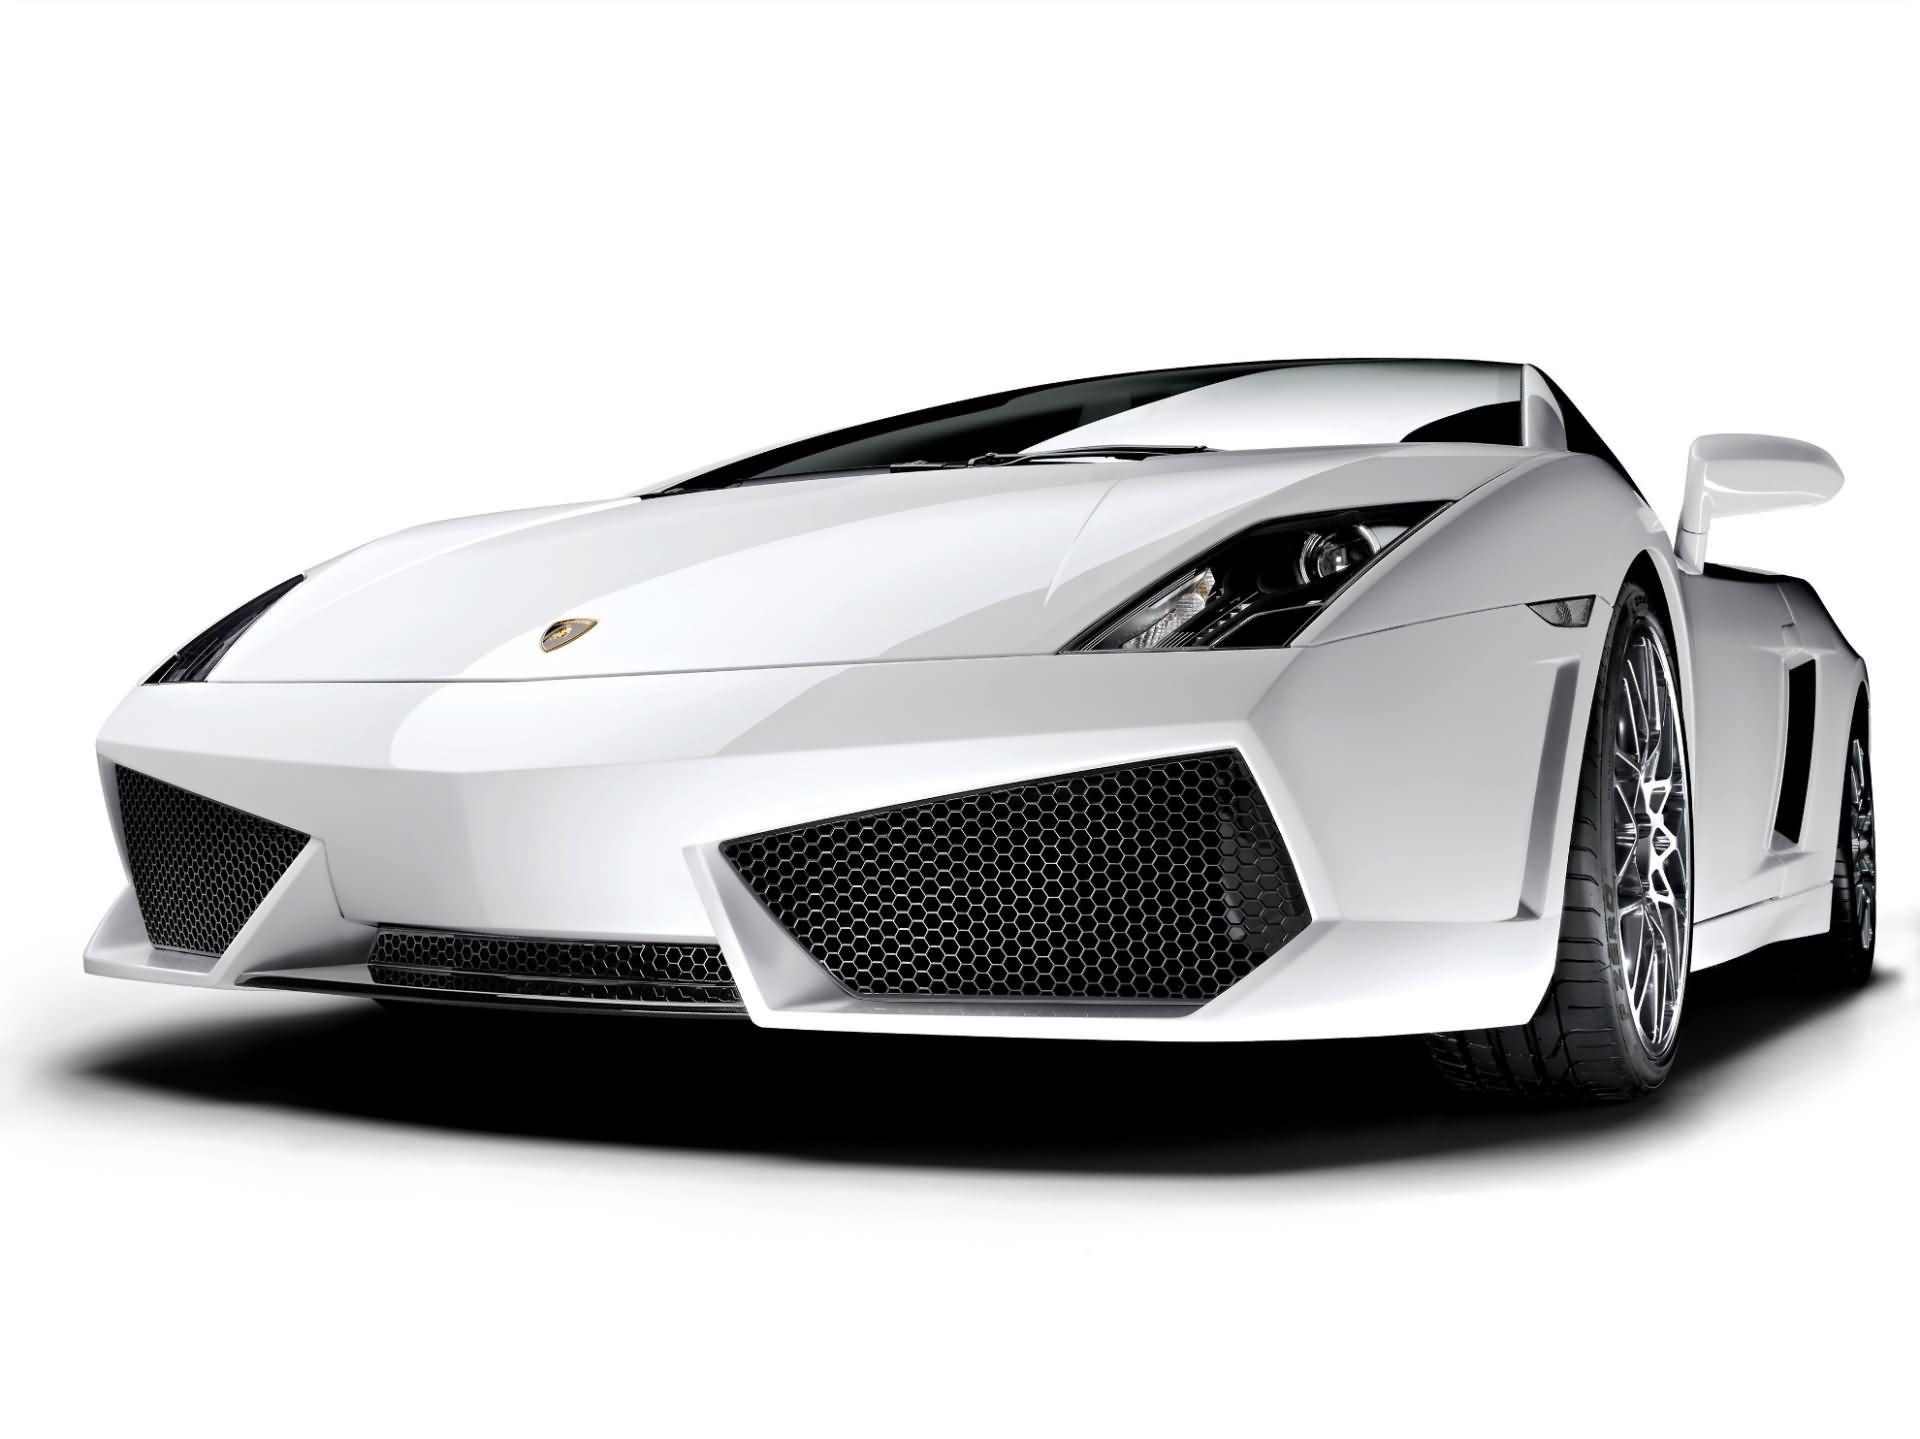 Lamborghini Gallardo LP 560-4 - Front